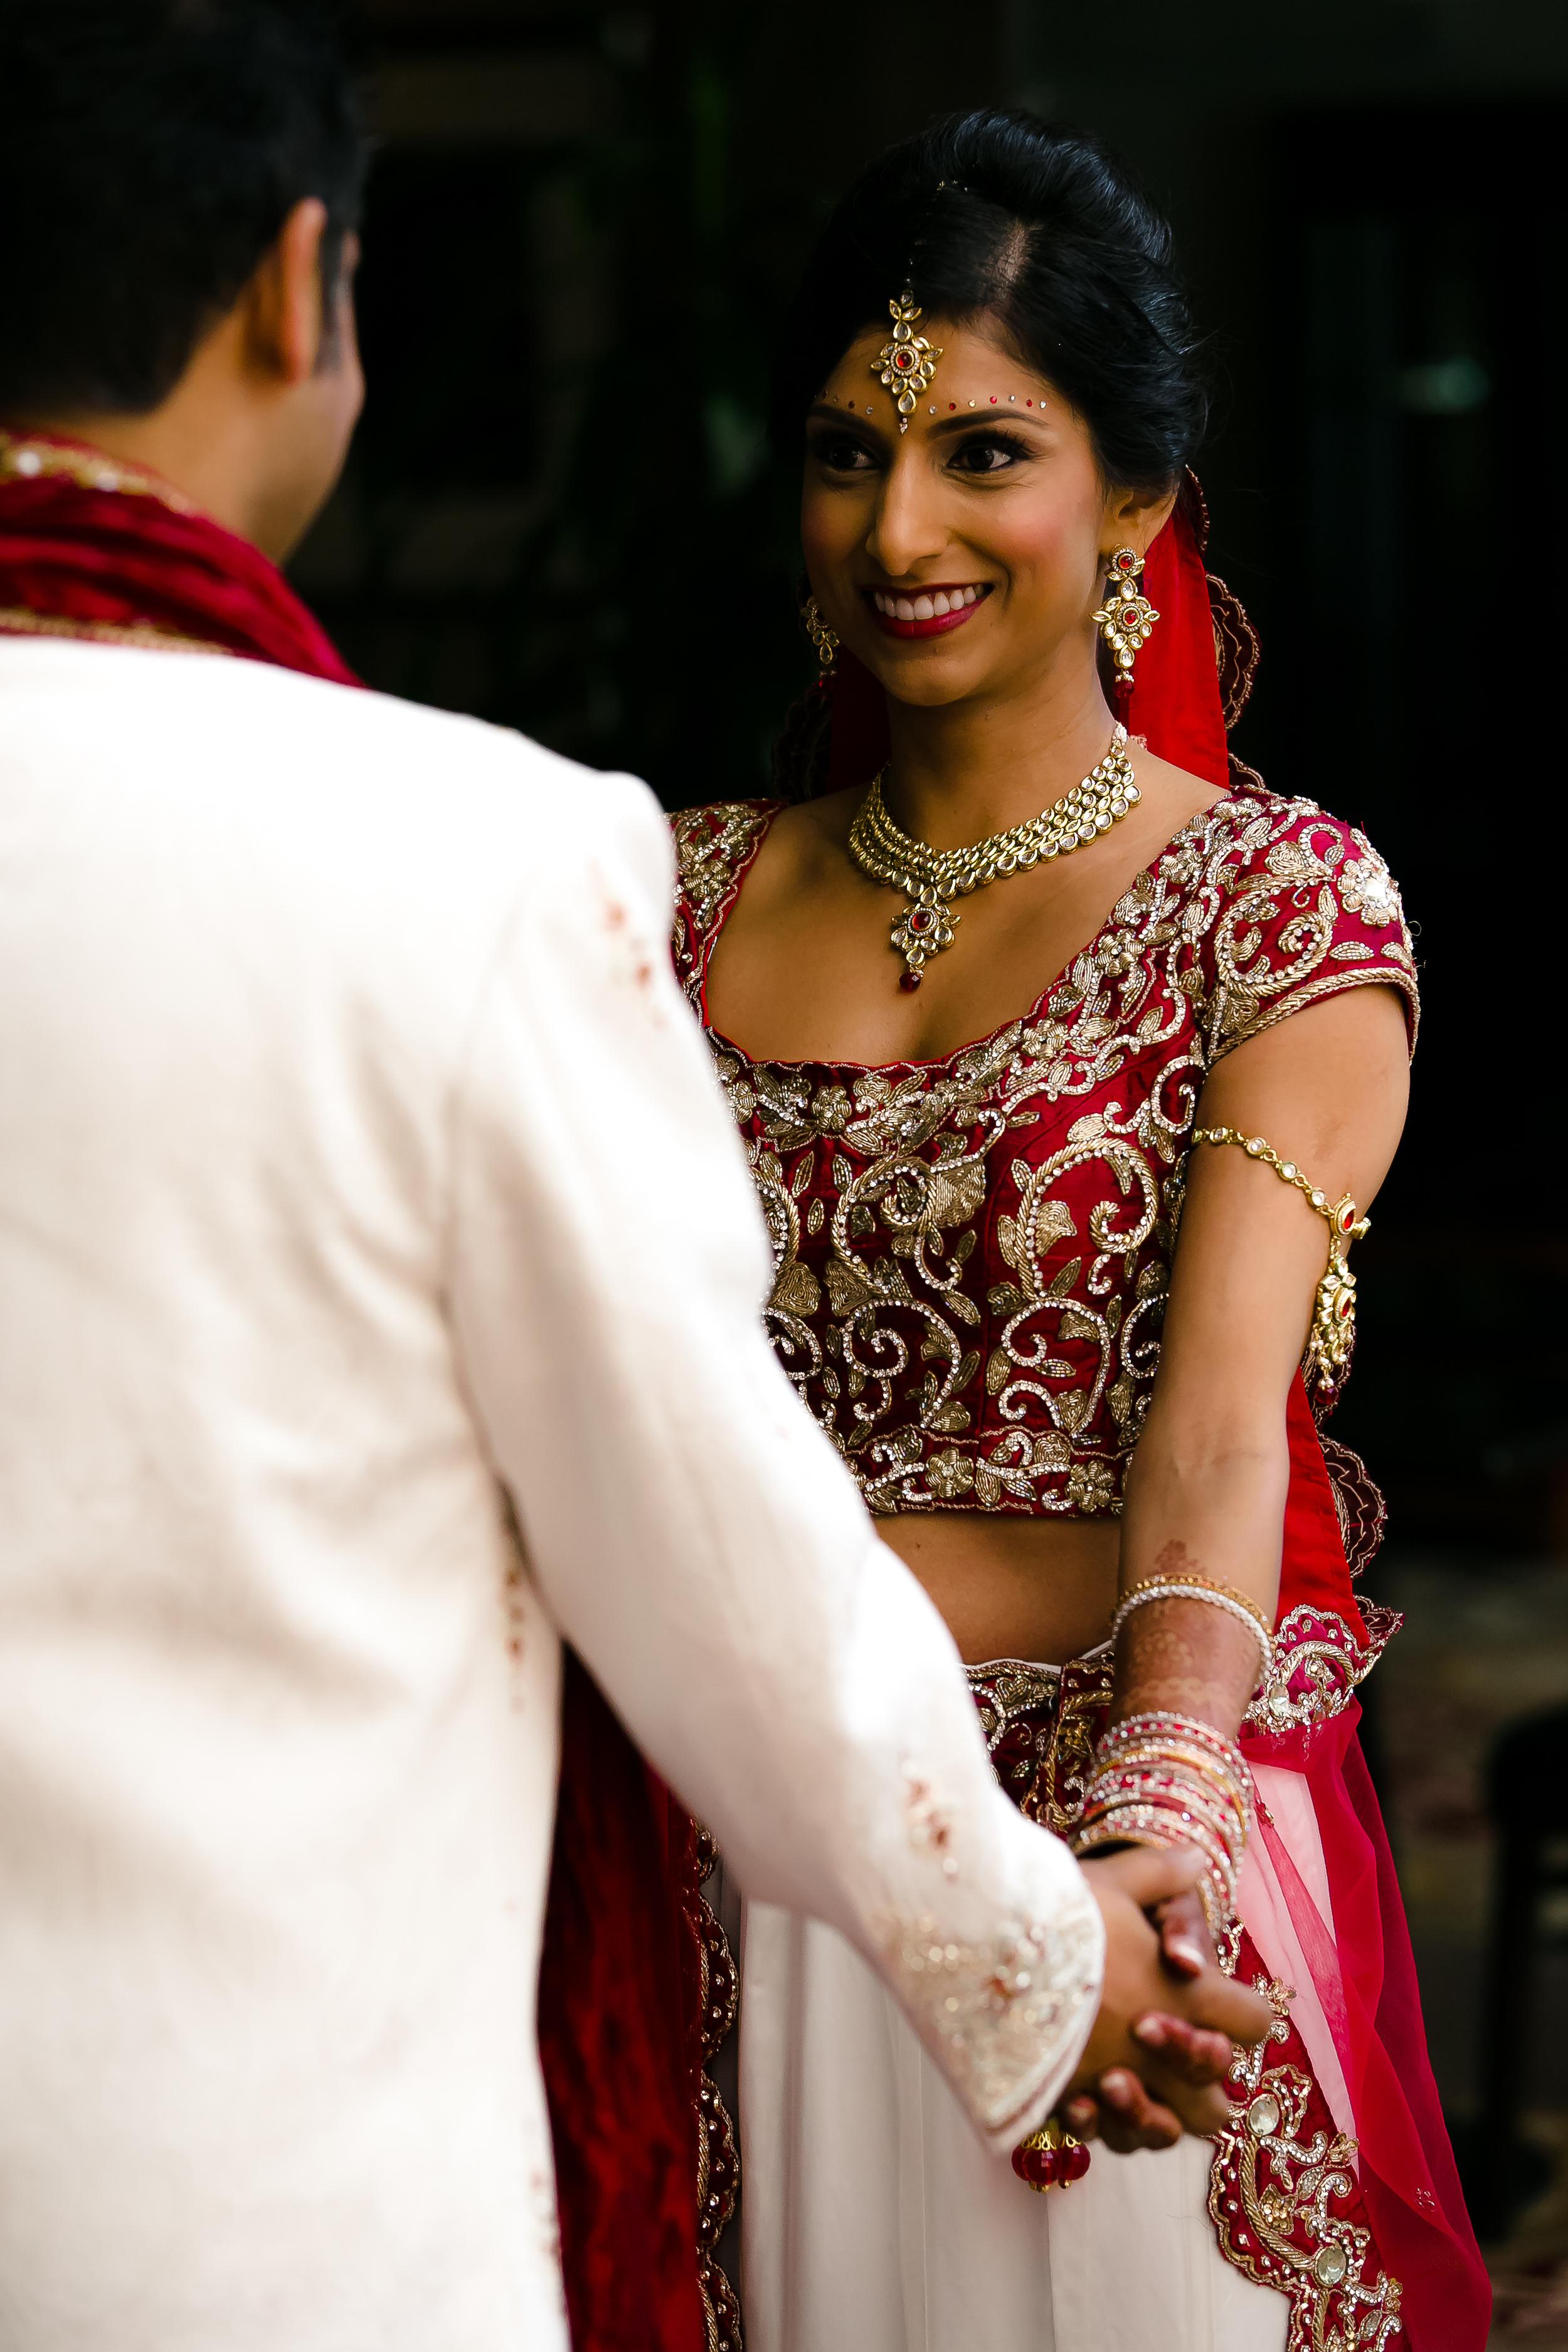 SOUTHEAST-ASIAN-INDIAN-WEDDING_013.jpg